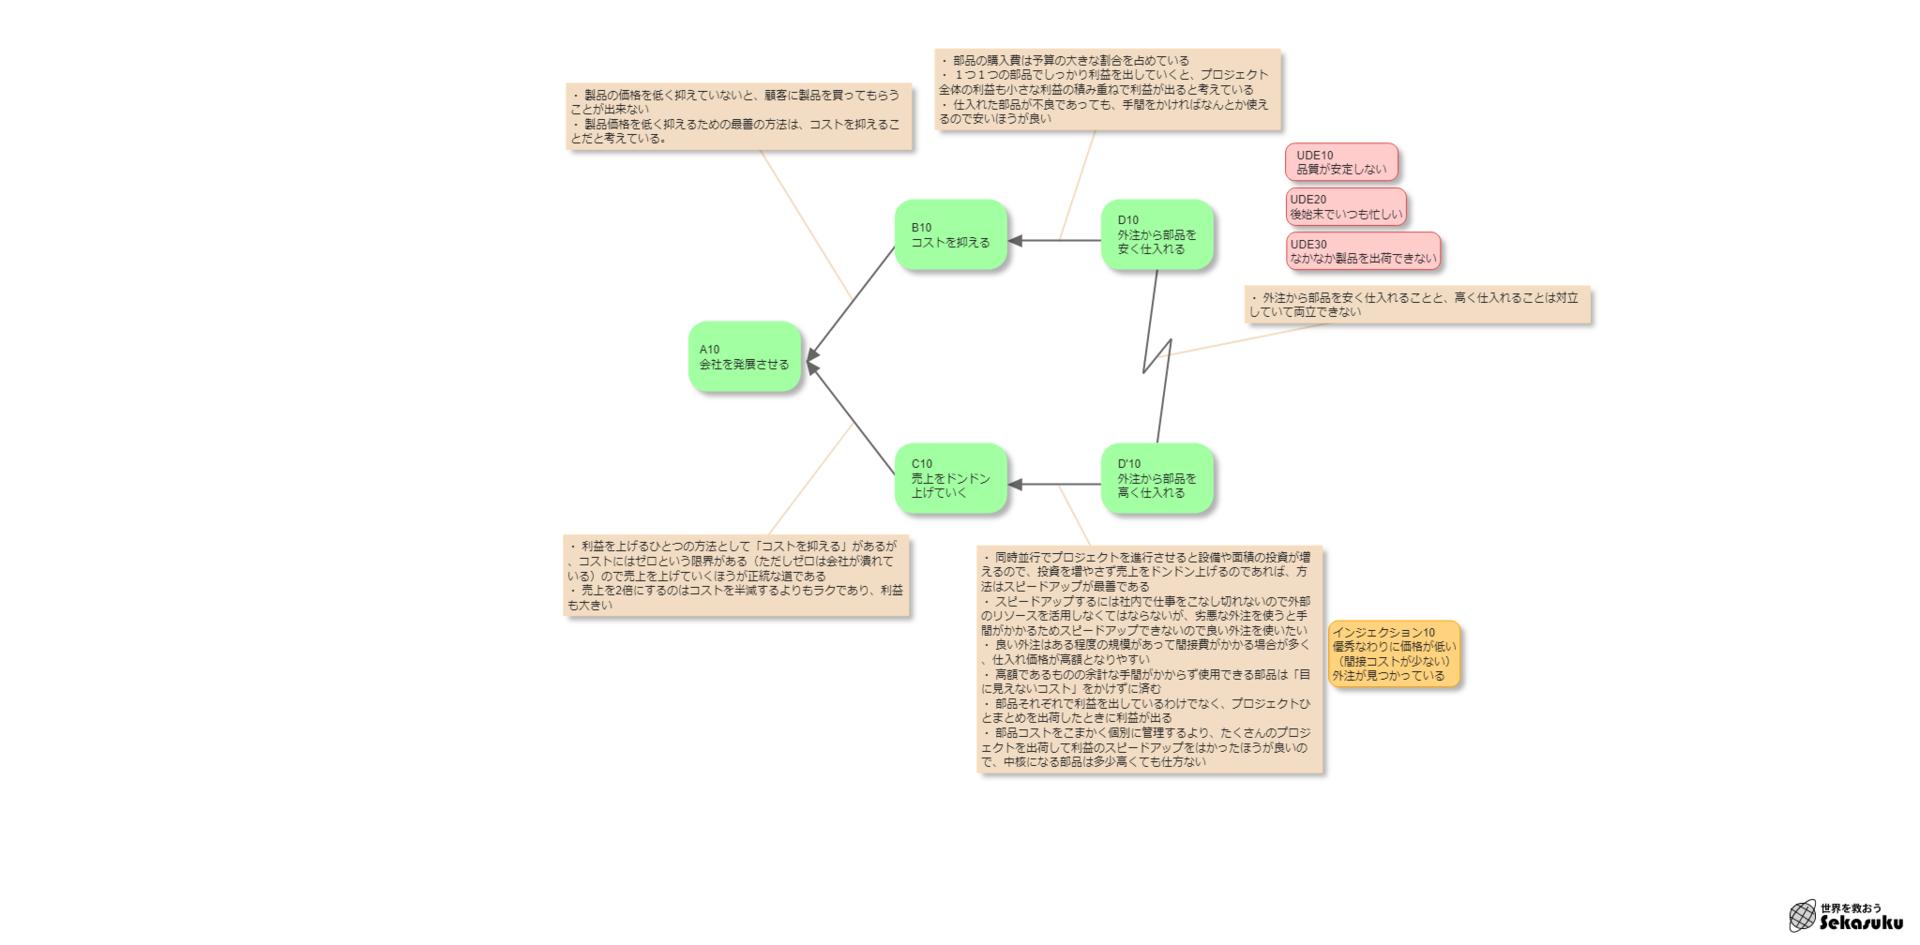 sekasuku_project445_2019-08-21-1735.png